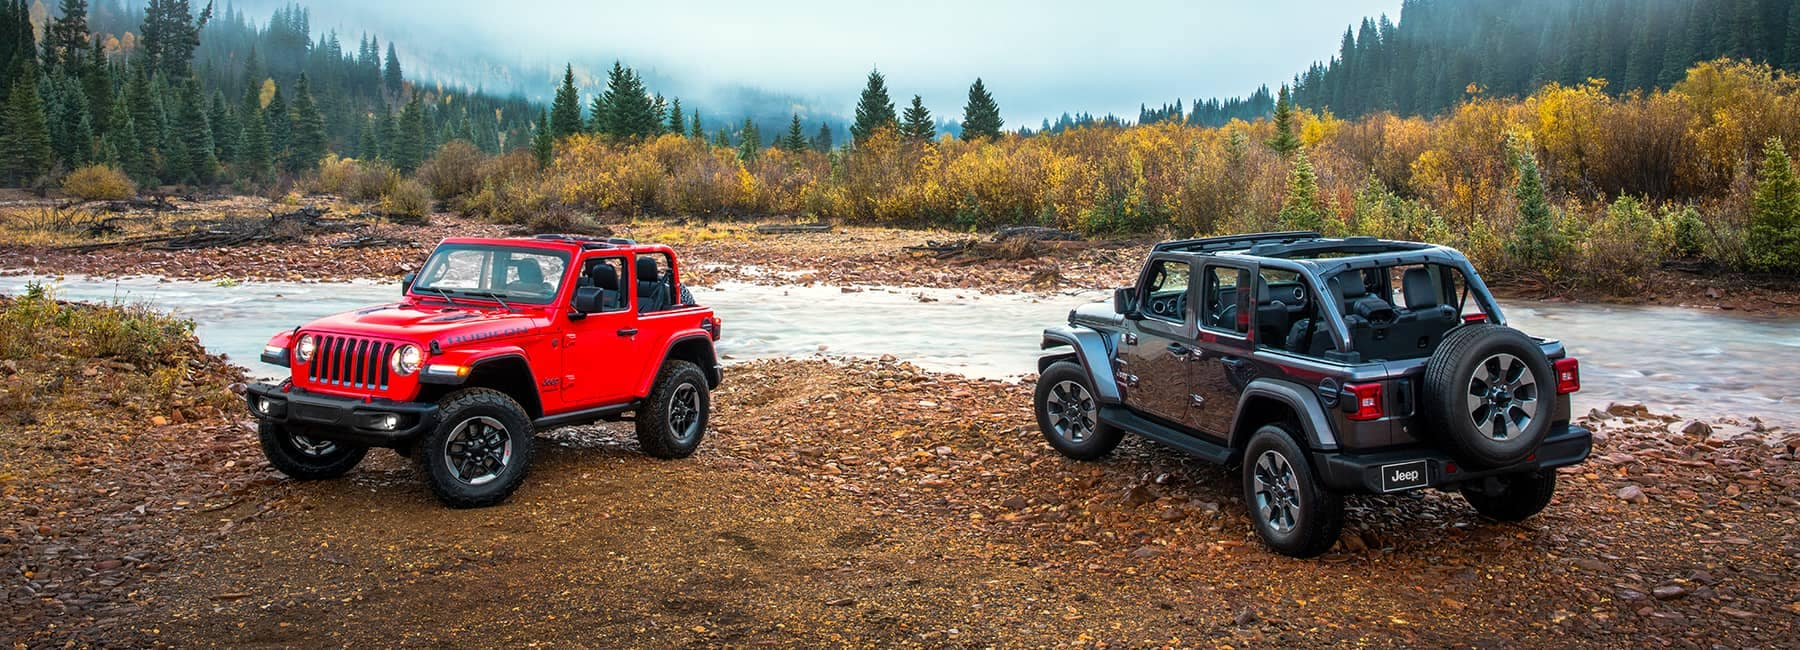 jeep wrangler unlimited vs toyota 4runner mansfield jeep dealership. Black Bedroom Furniture Sets. Home Design Ideas